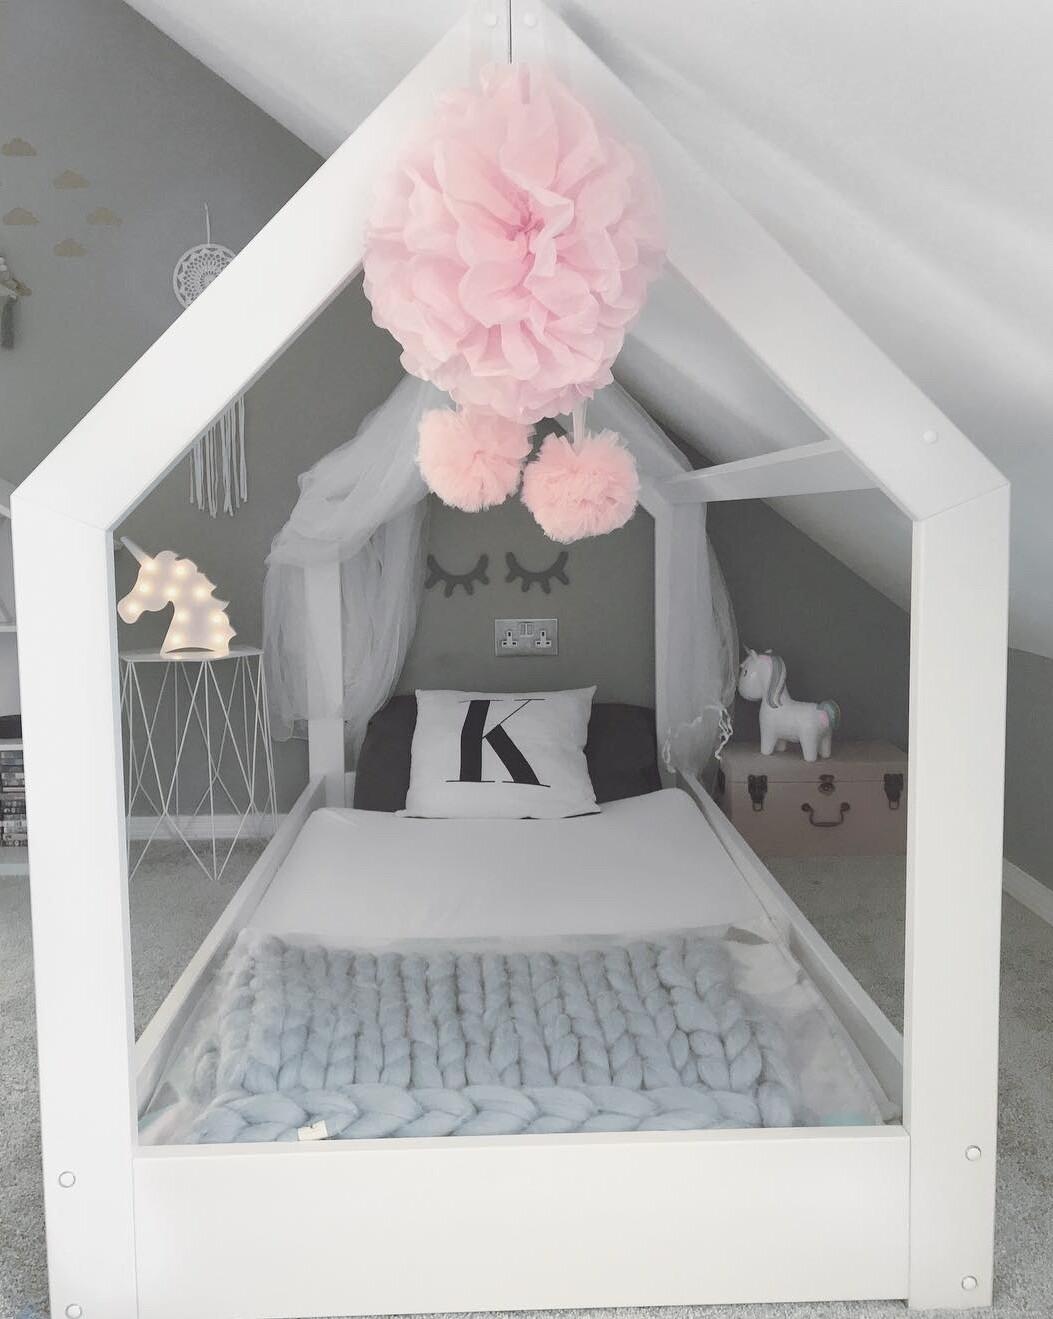 Wooden Montessori Basic Side House Bed Frame - Thicker Frame